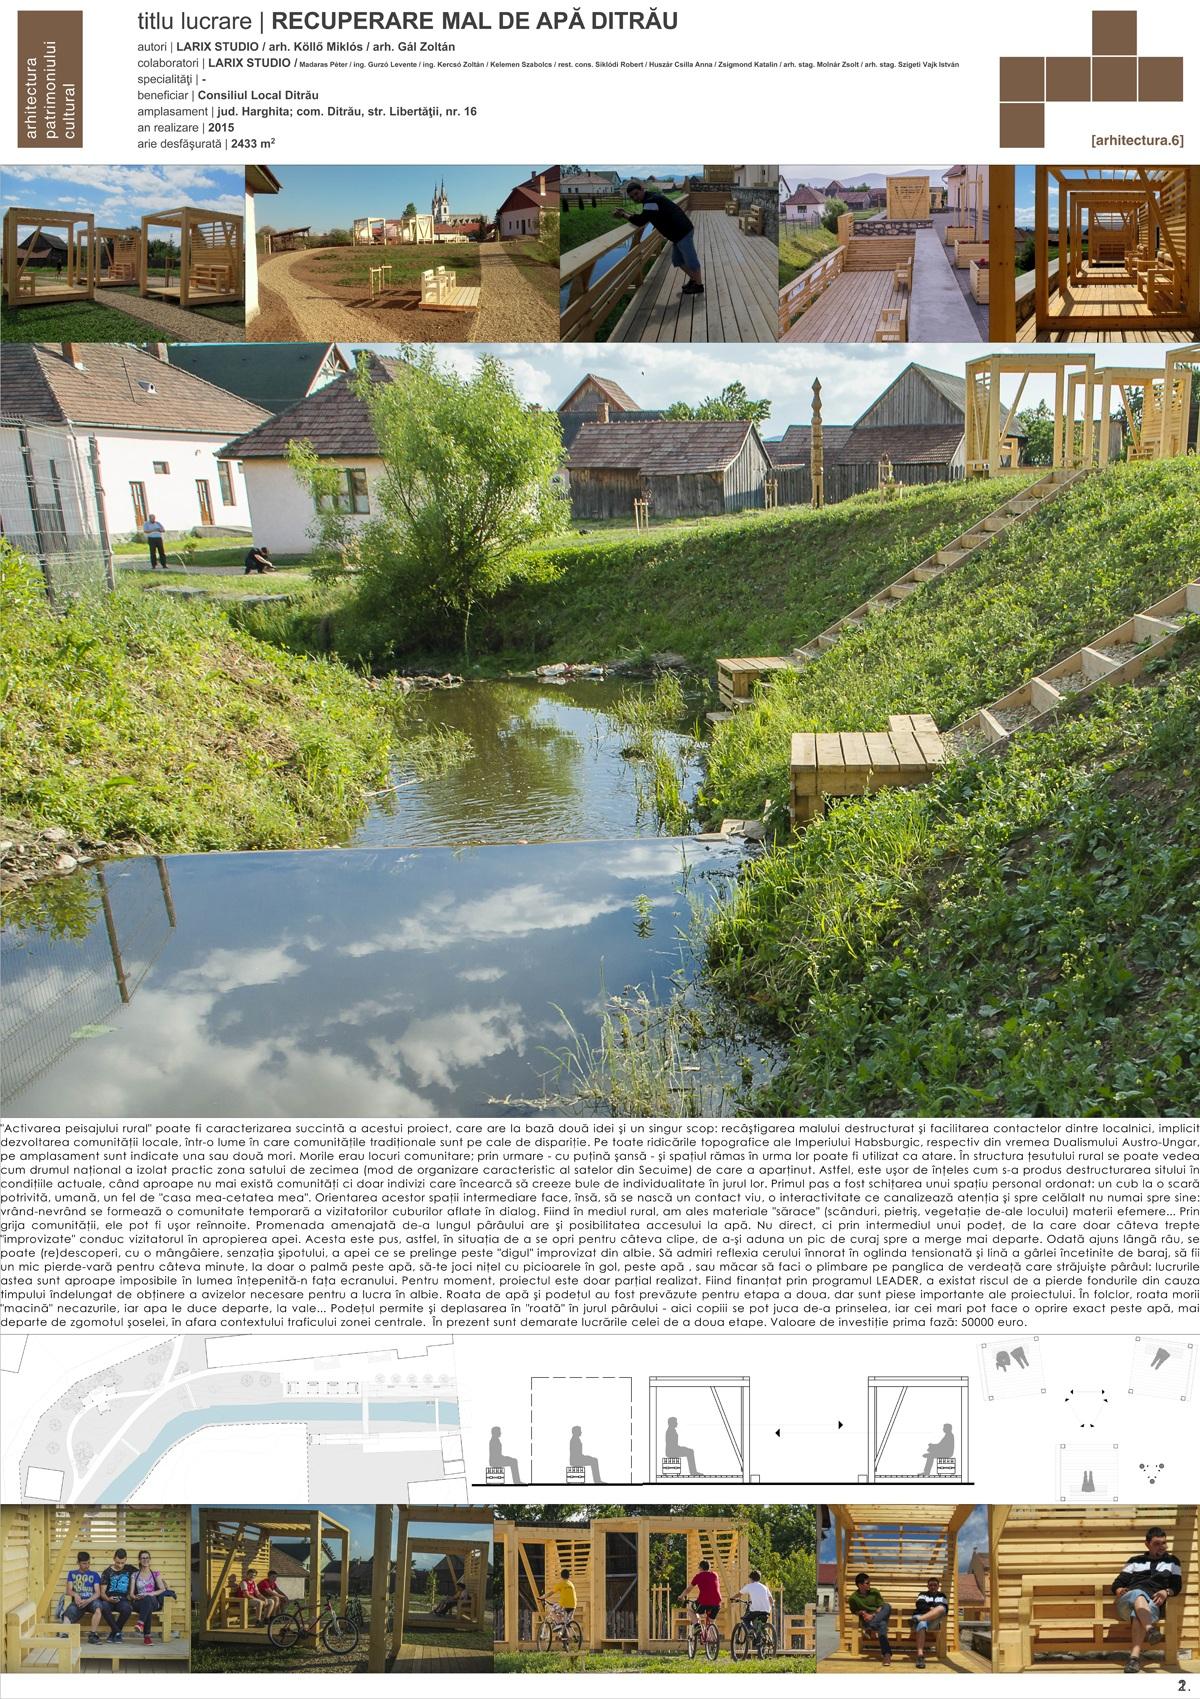 23_Recuperare mal de apa Ditrau2